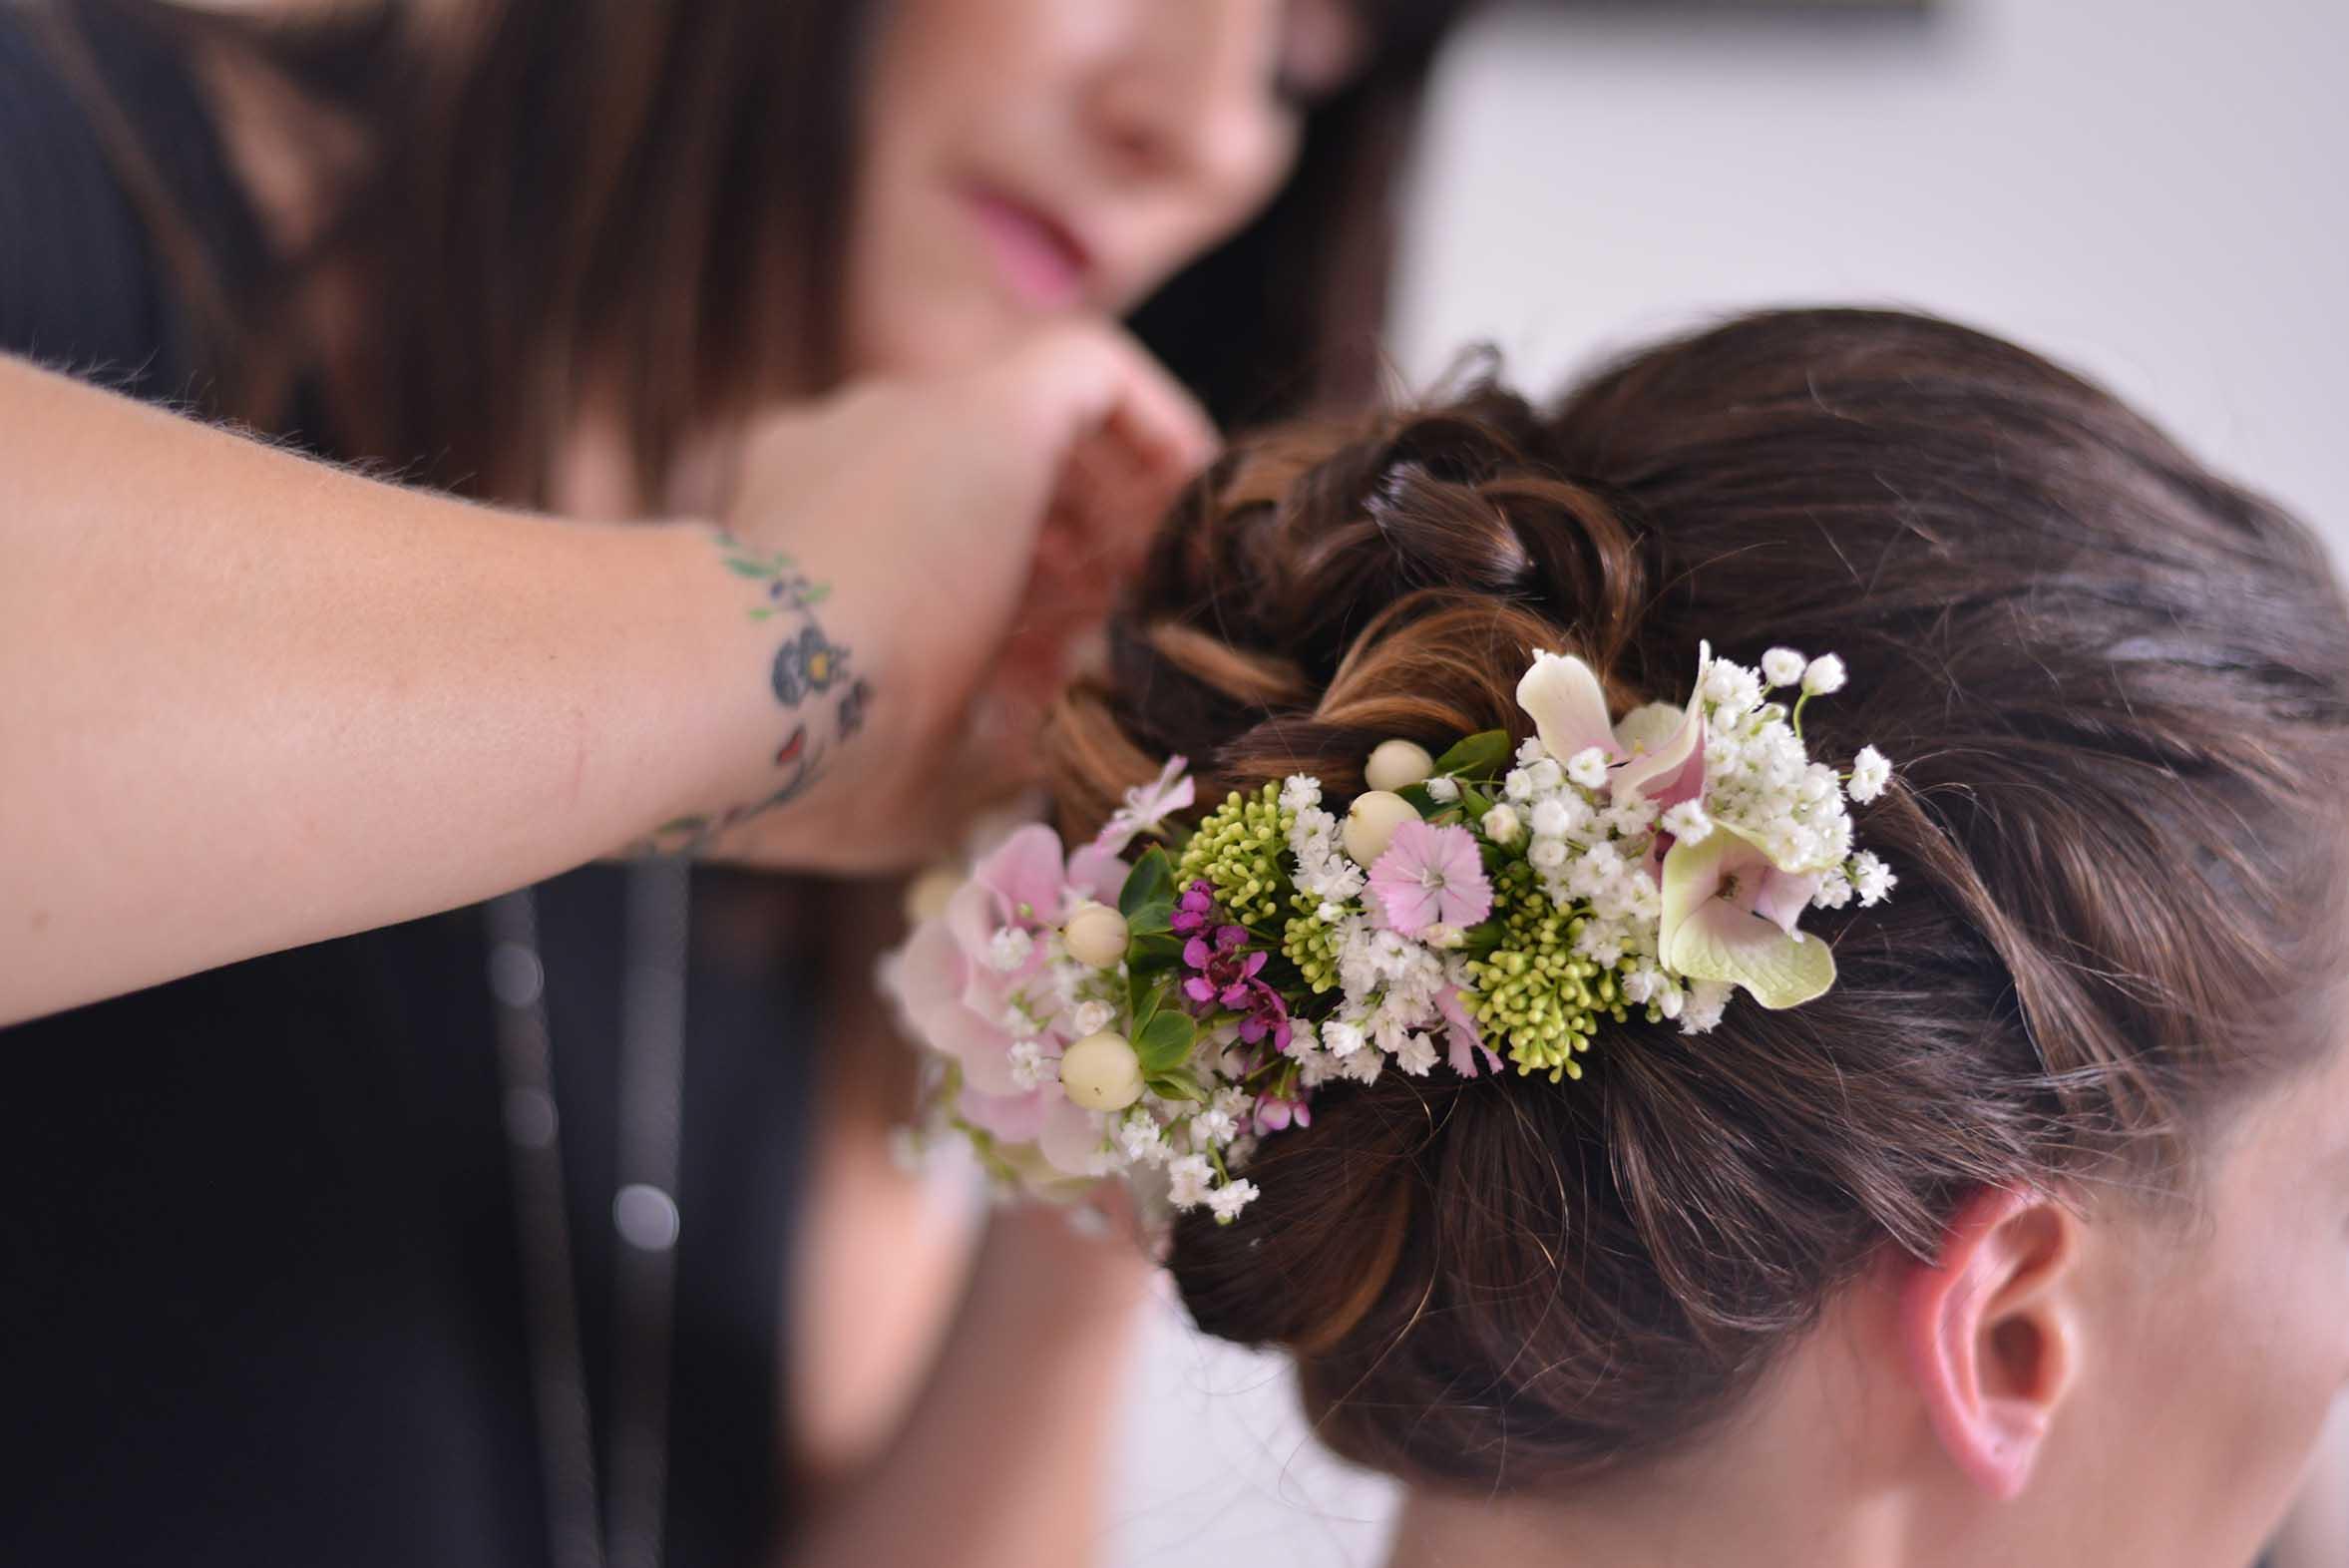 newStyle |Hairstyling & Make-up